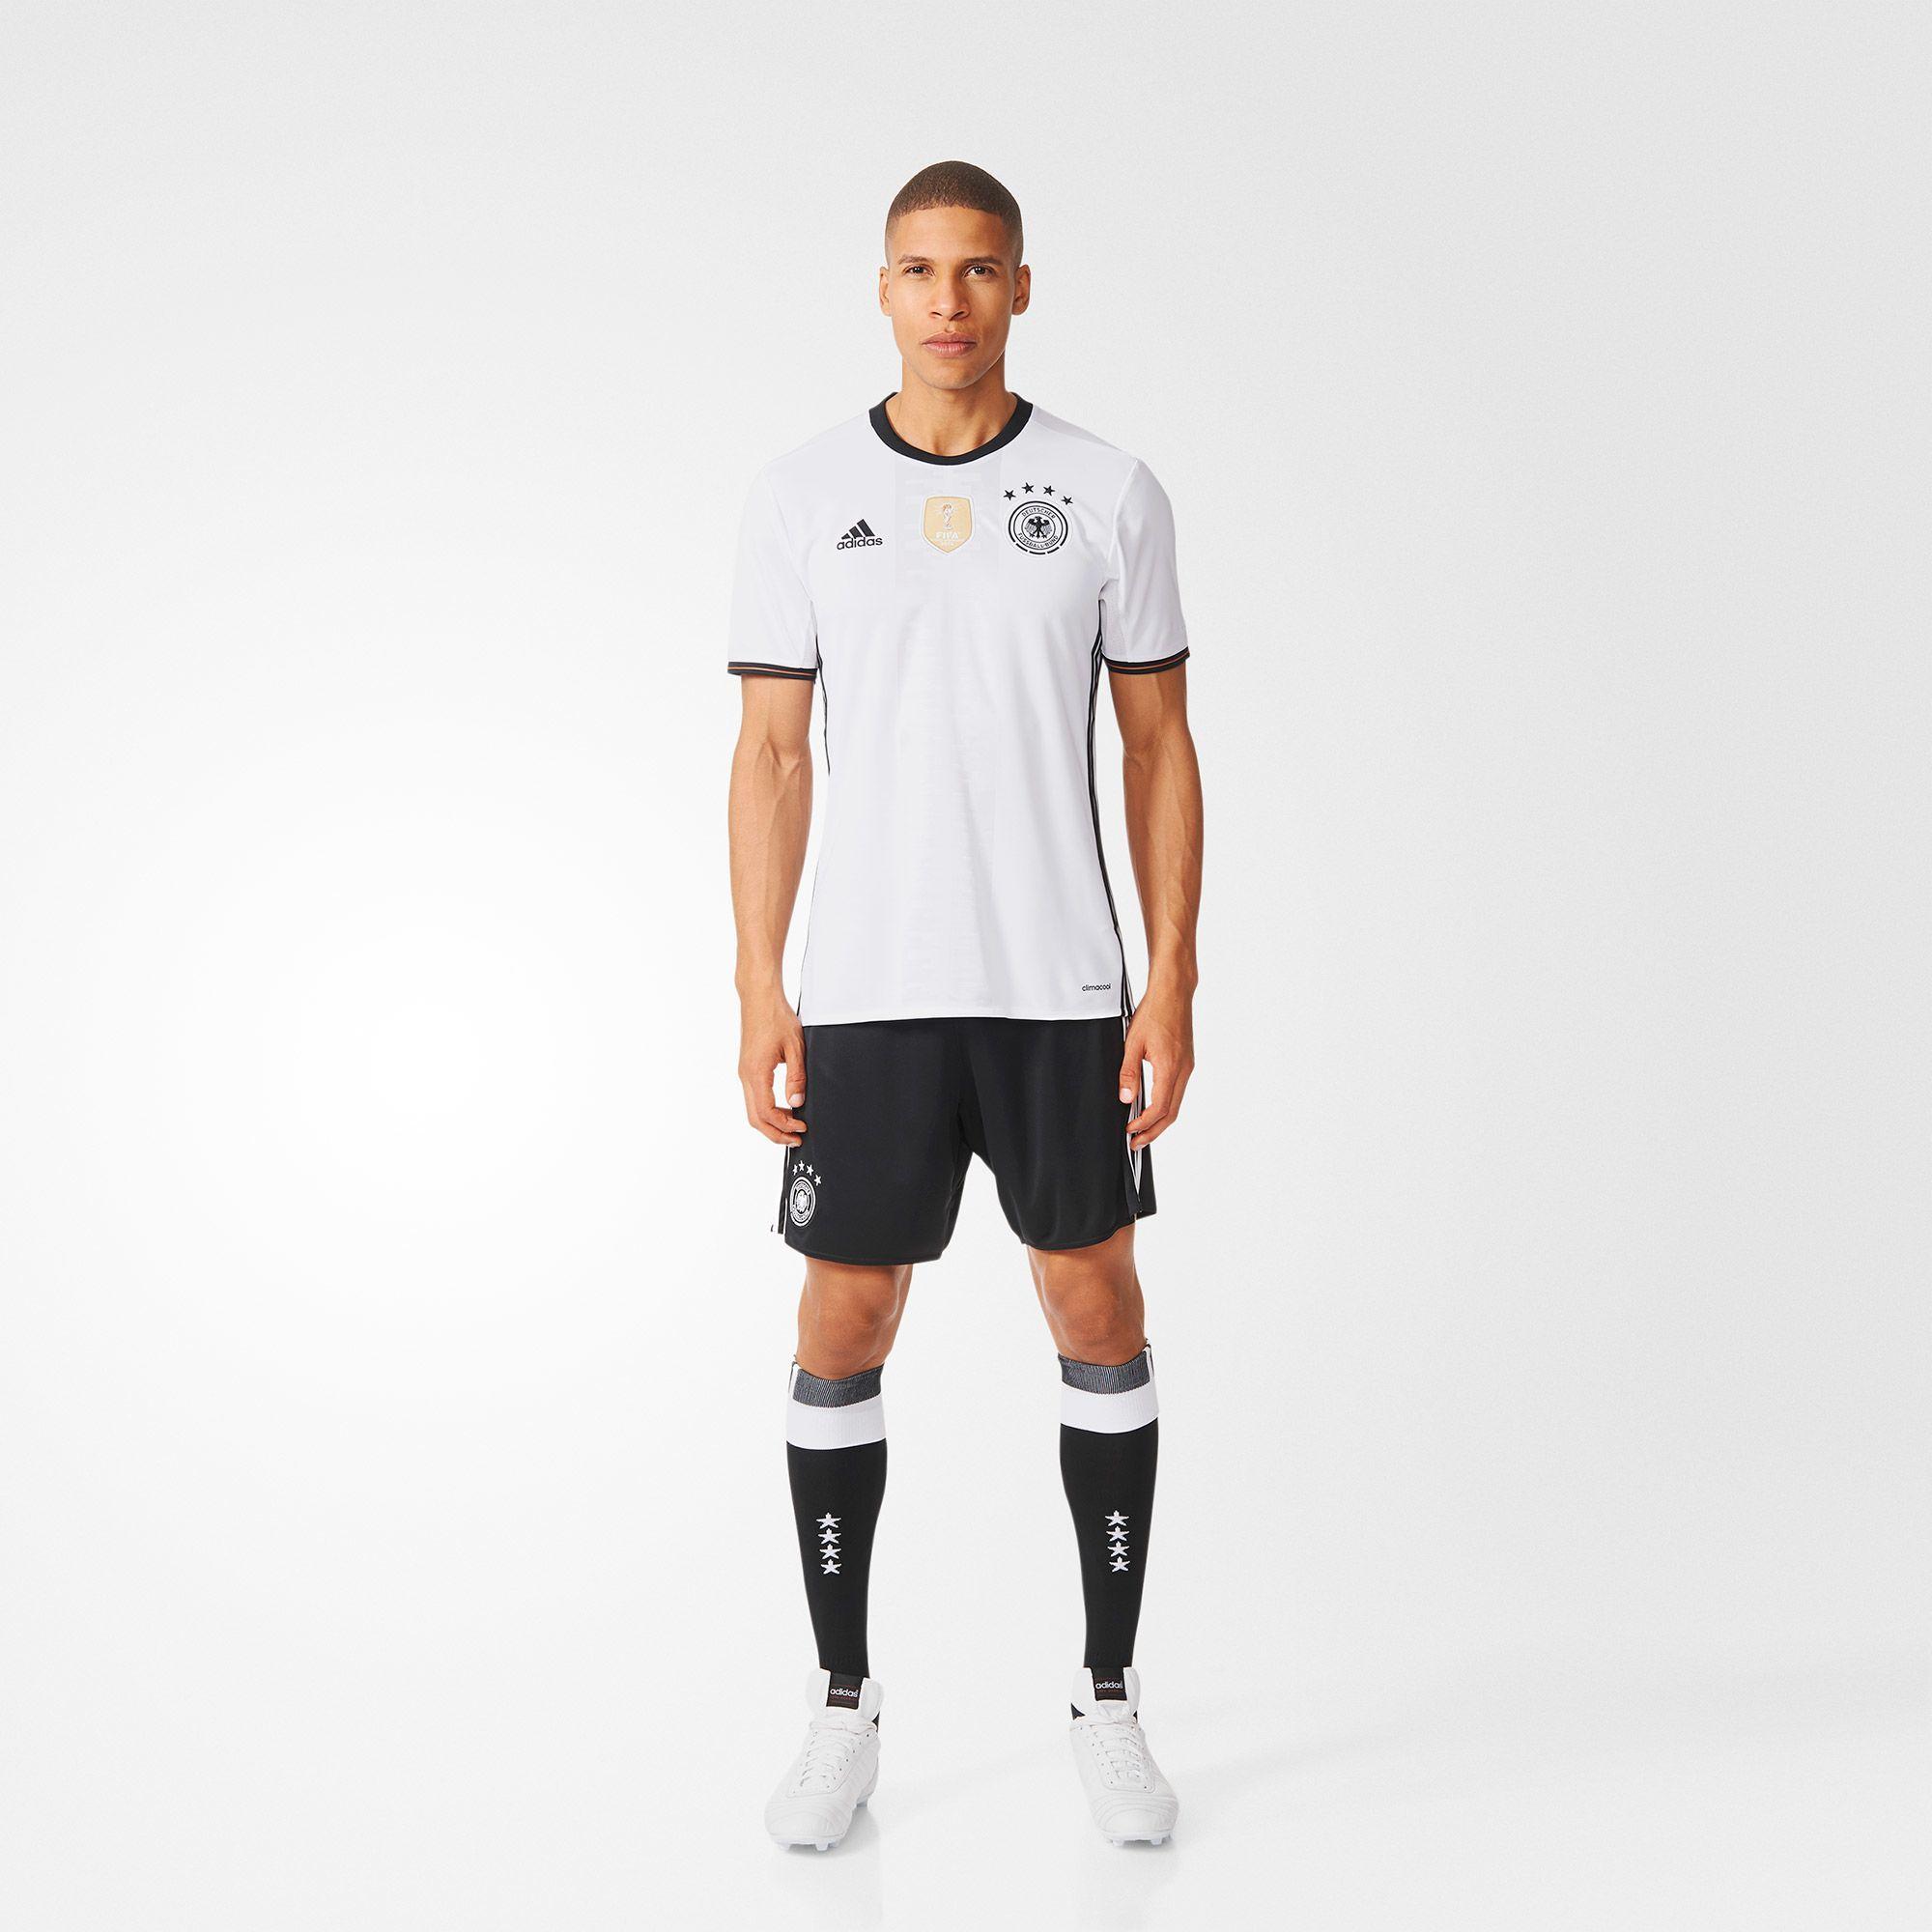 adidas UEFA EURO 2016 DFB Heimtrikot Replica - weiß   adidas Deutschland